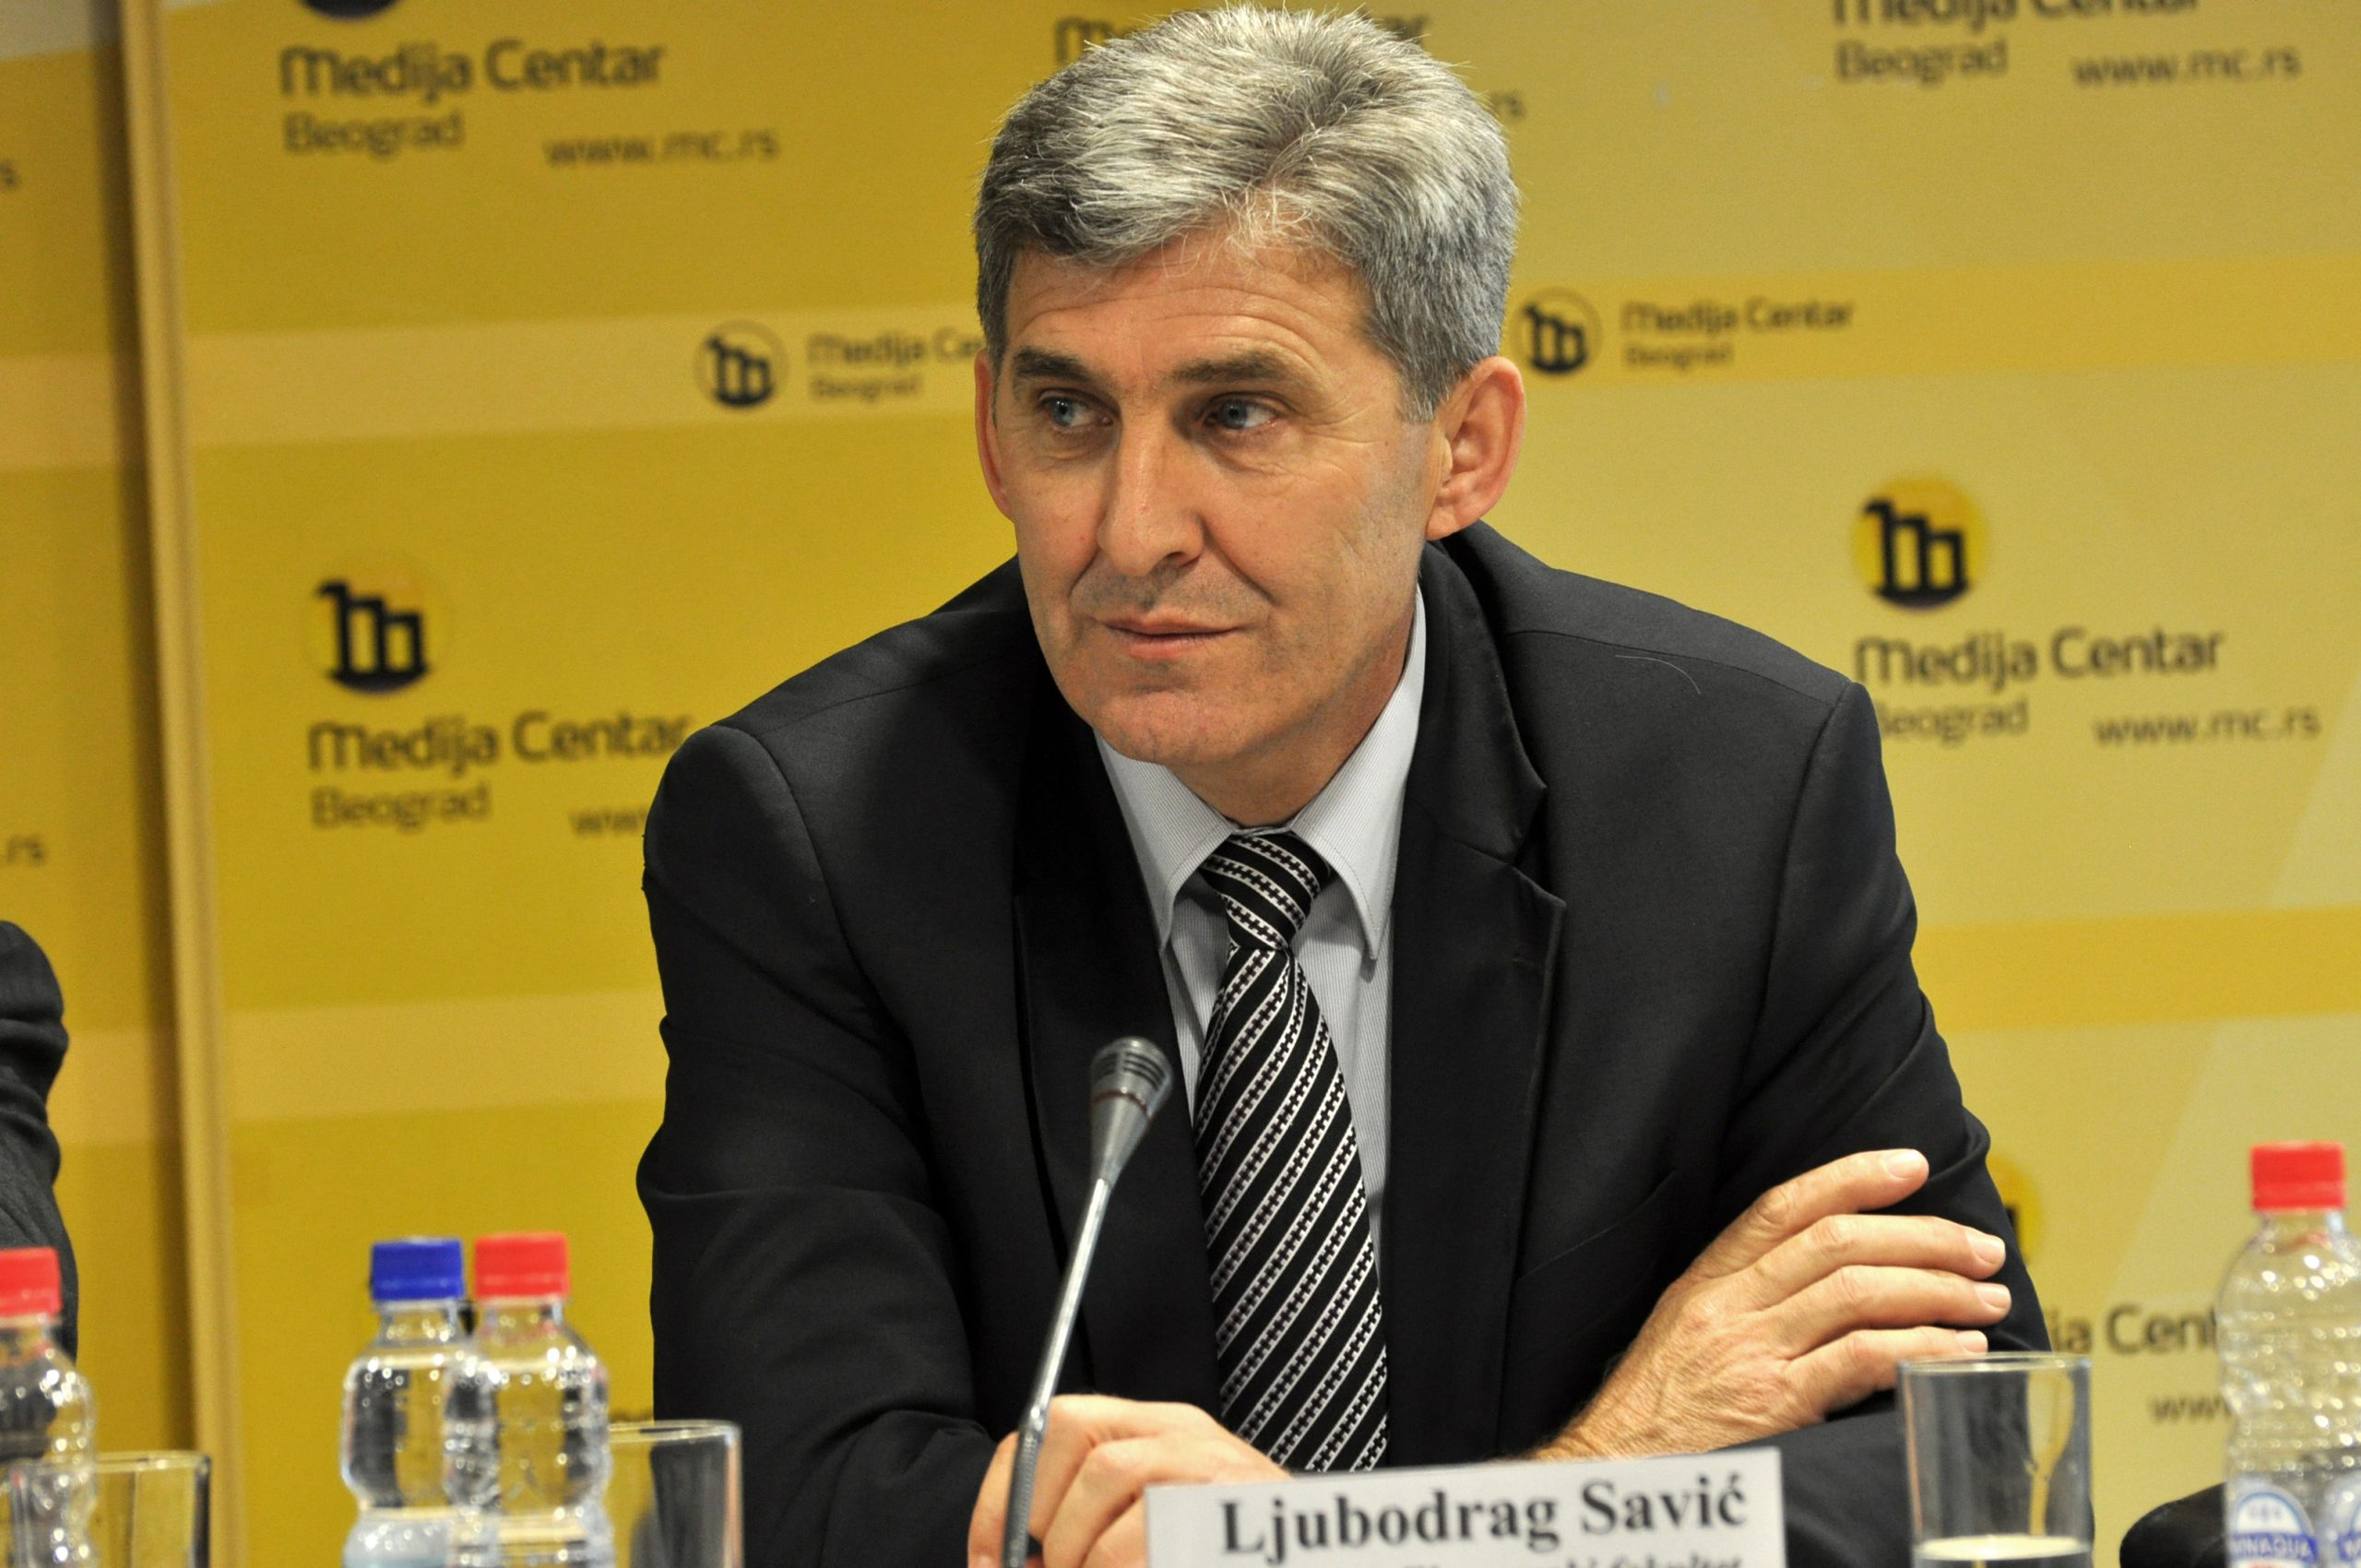 Ljubodrag Savić Foto: Medija Centar Beograd